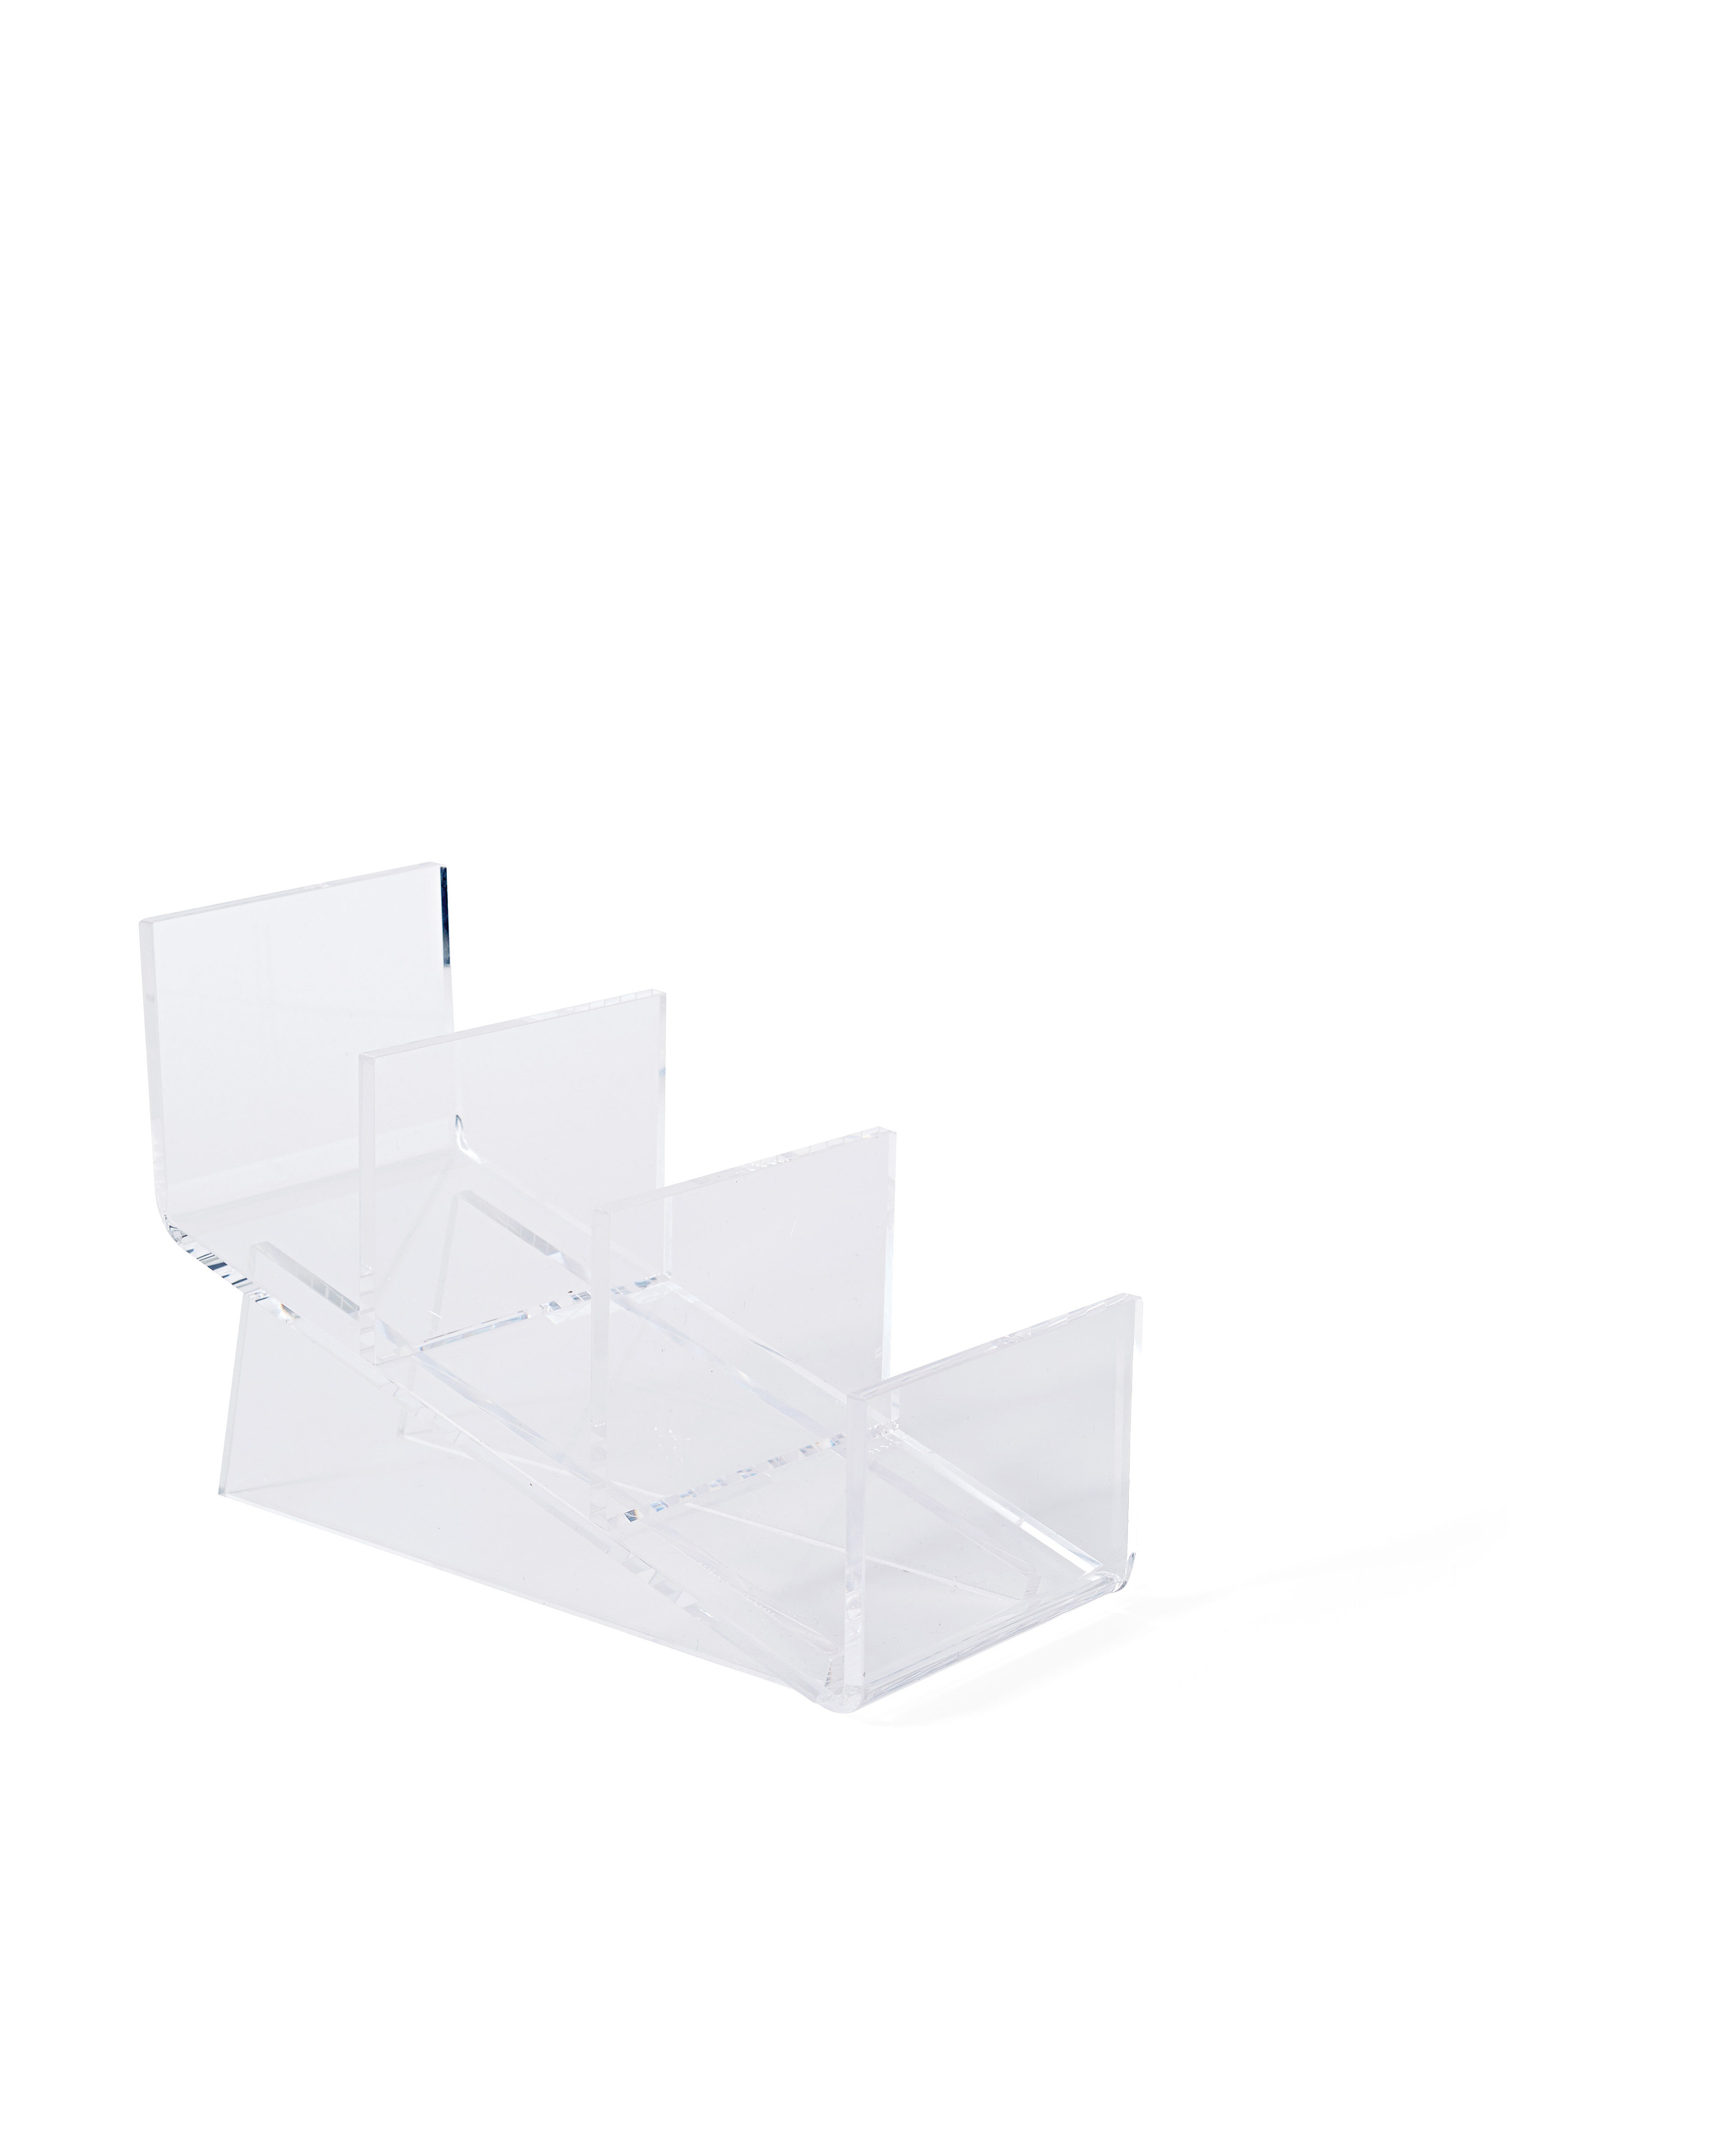 clutch-bag-lucite-display-stand-371-d112790.jpg